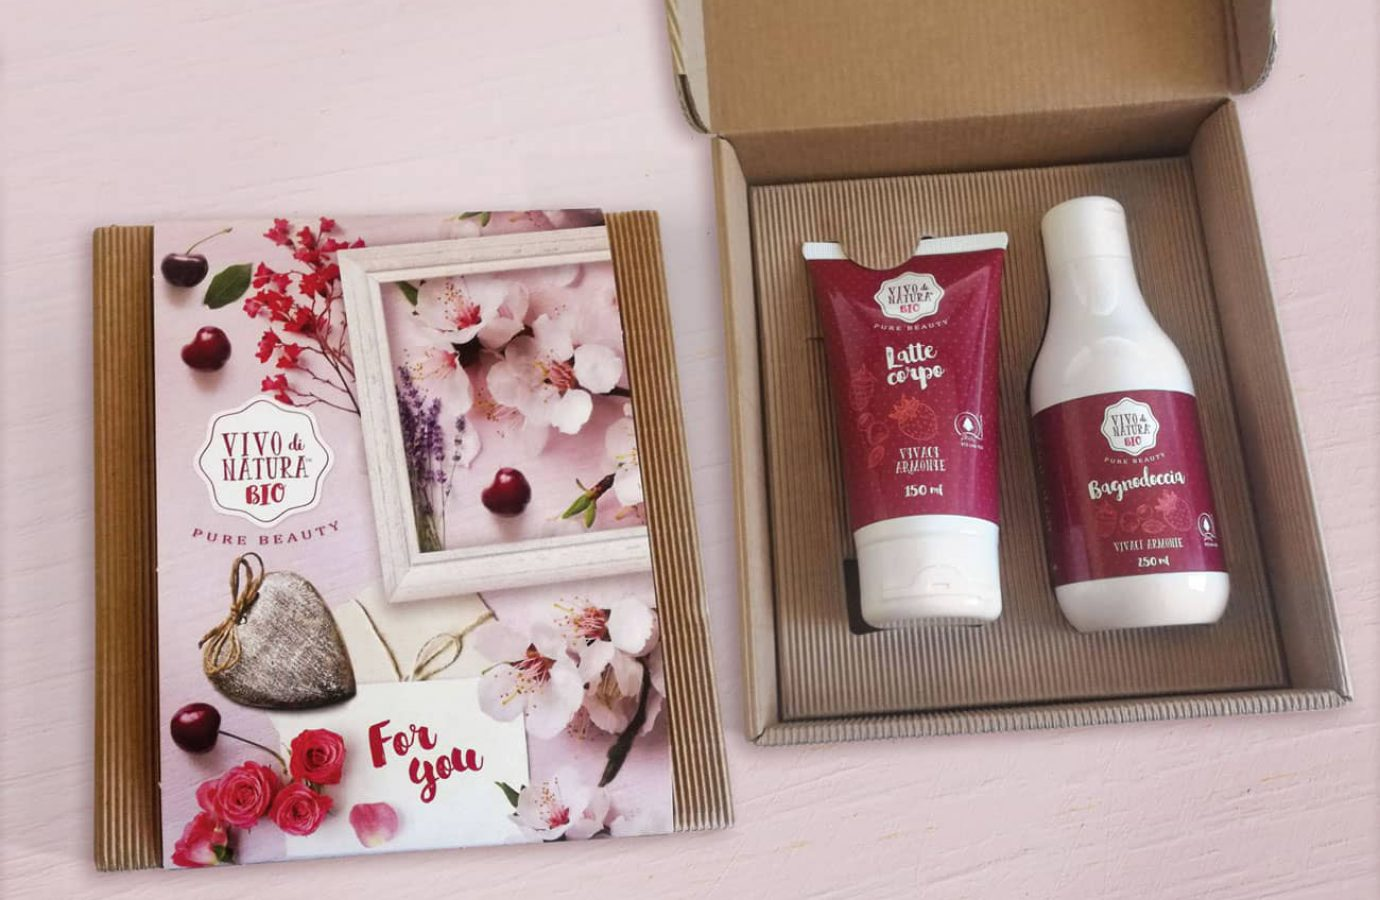 WillBe packaging design cosmesi idee regalo Vivo di Natura scatola Vivaci Armonie